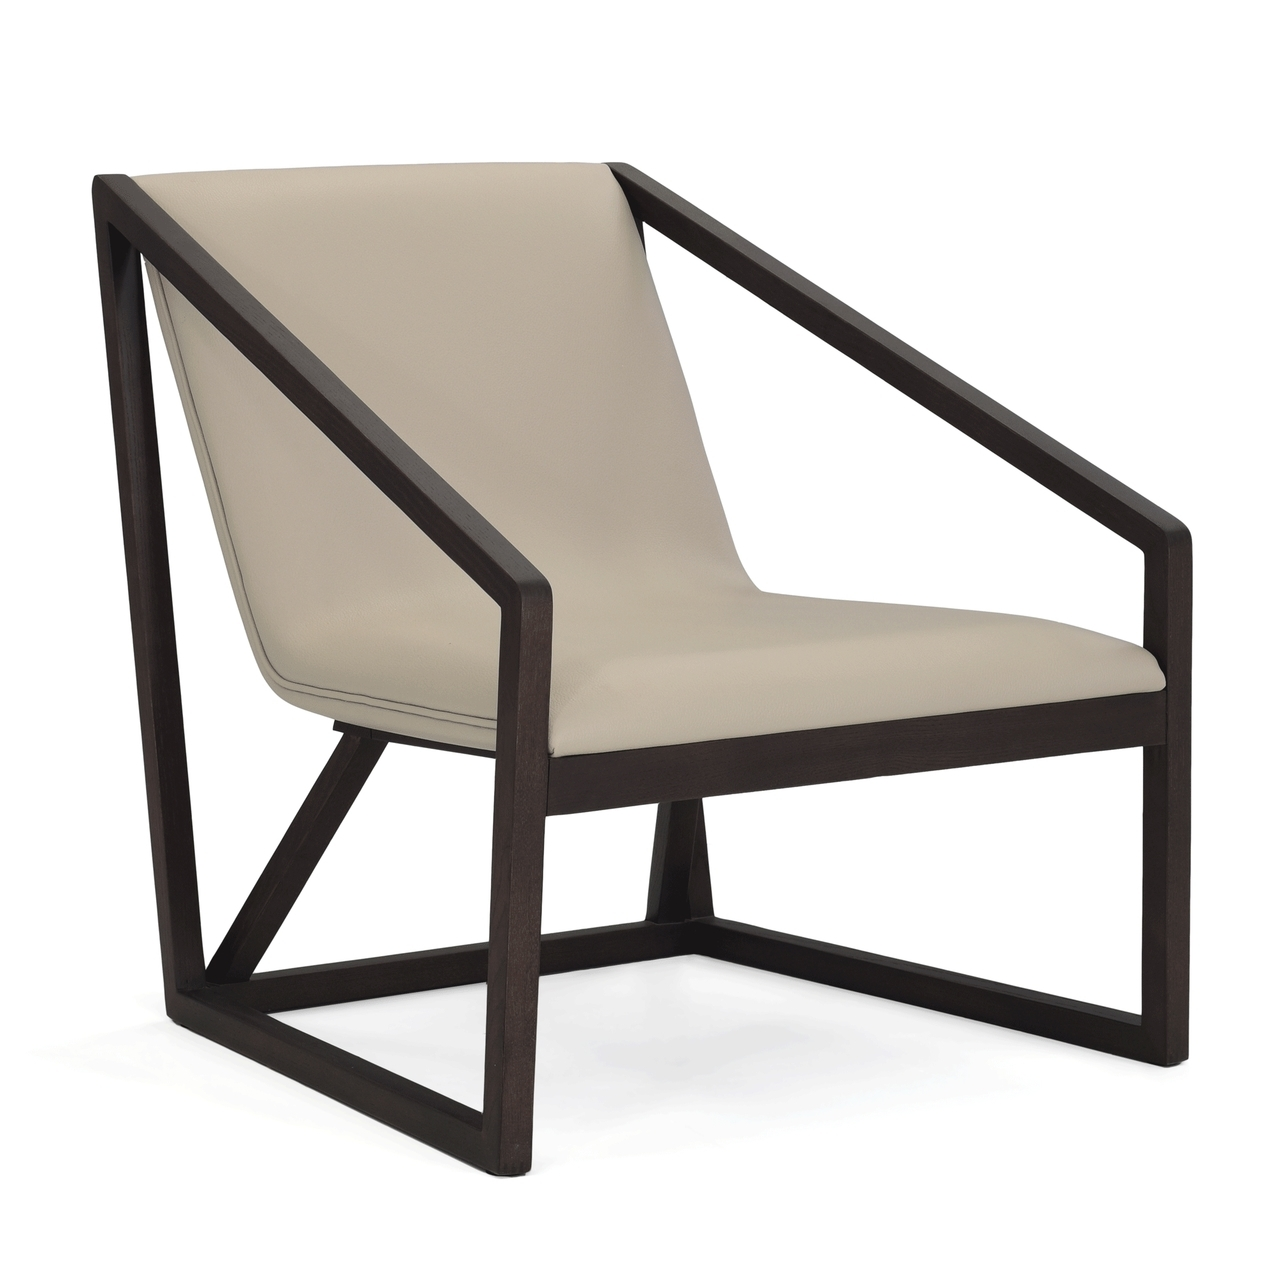 Sala wood frame lounge chair